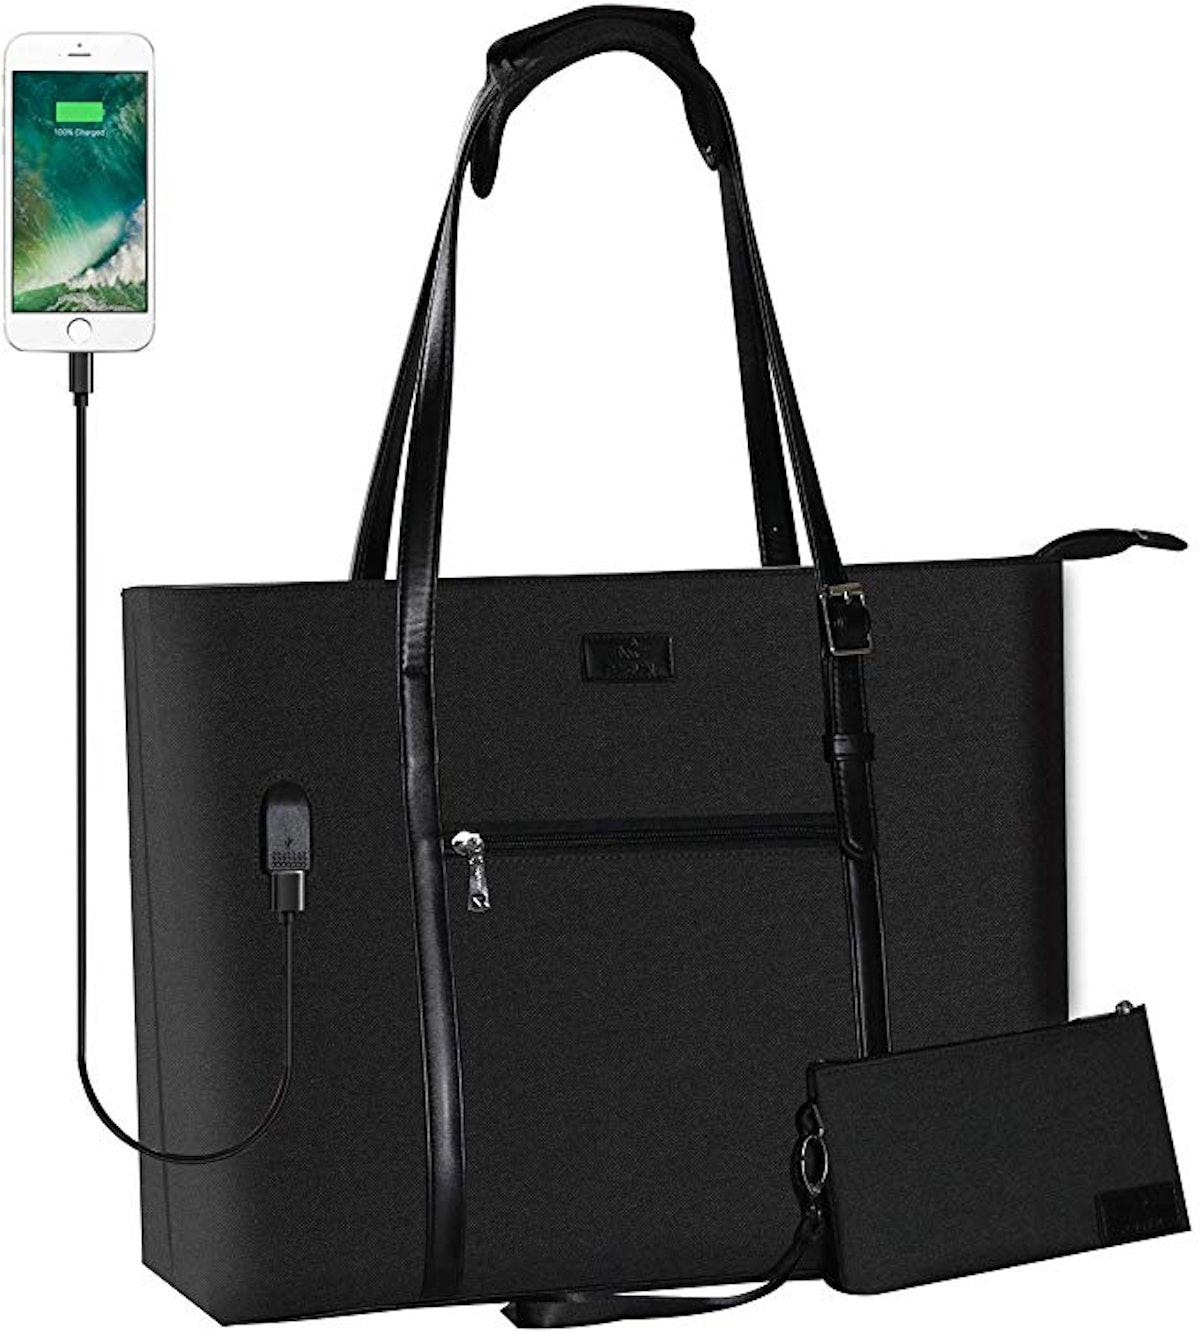 Chomeiu USB Laptop Tote Bag